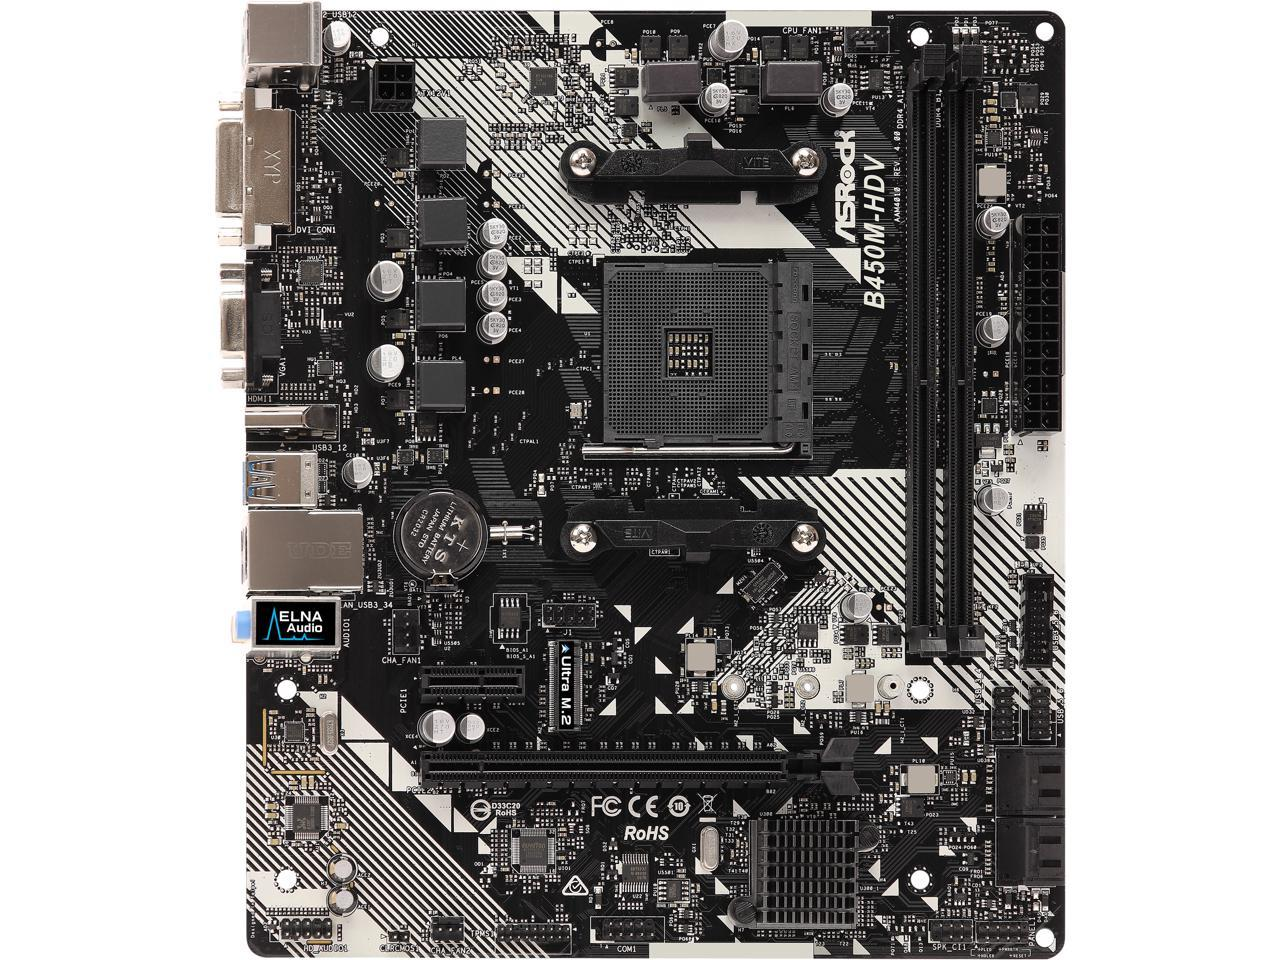 Newegg: ASRock B450M-HDV R4.0 AM4 AMD Promontory B450 SATA 6Gb/s Micro ATX AMD Motherboard @ .99